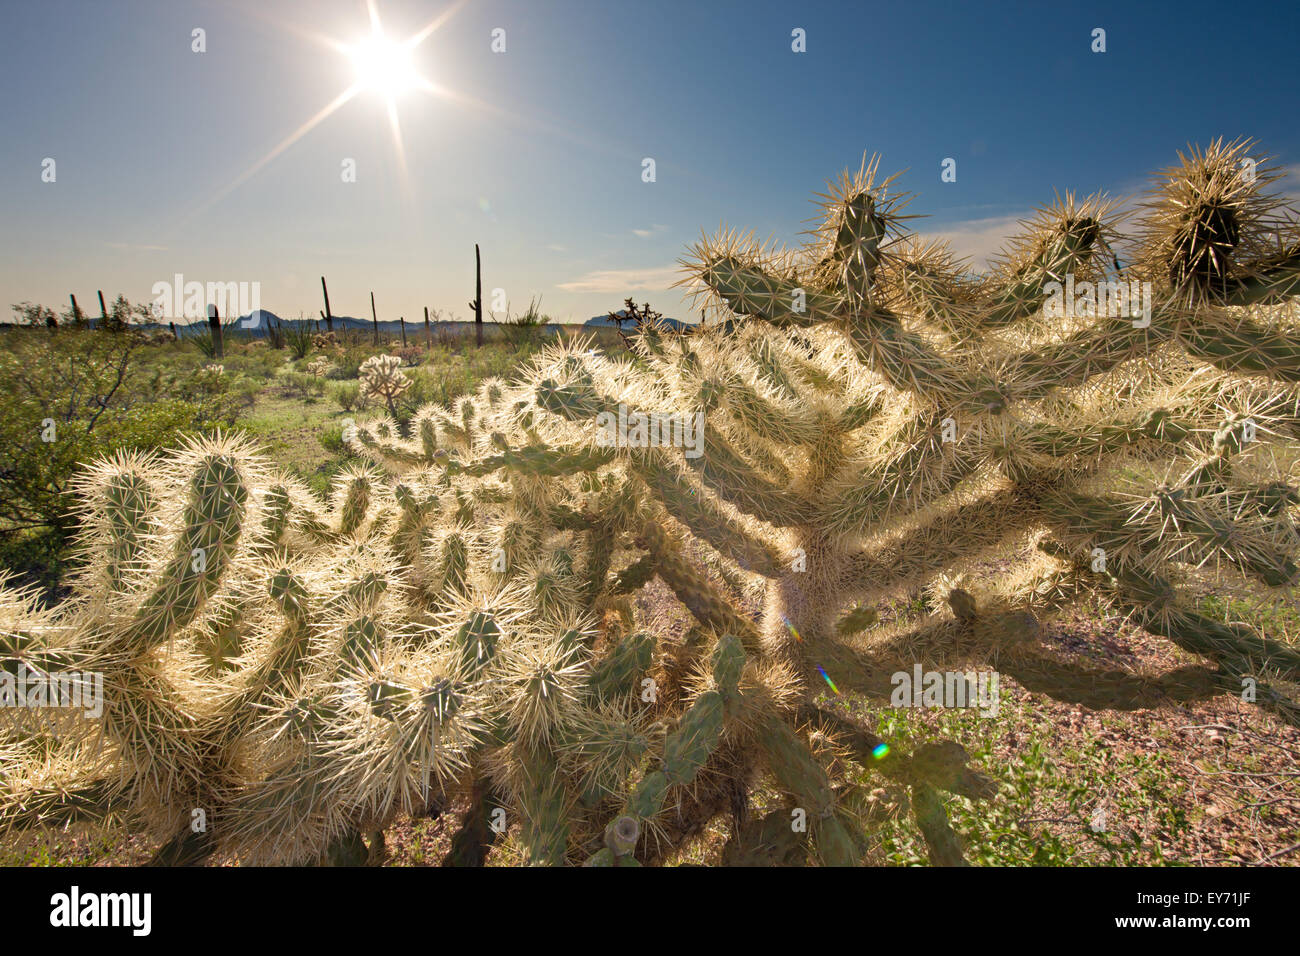 Teddy Bear Cholla Cactus, Opuntia Bigelovii, Organ Pipe National Monument, Arizona, USA Stockfoto